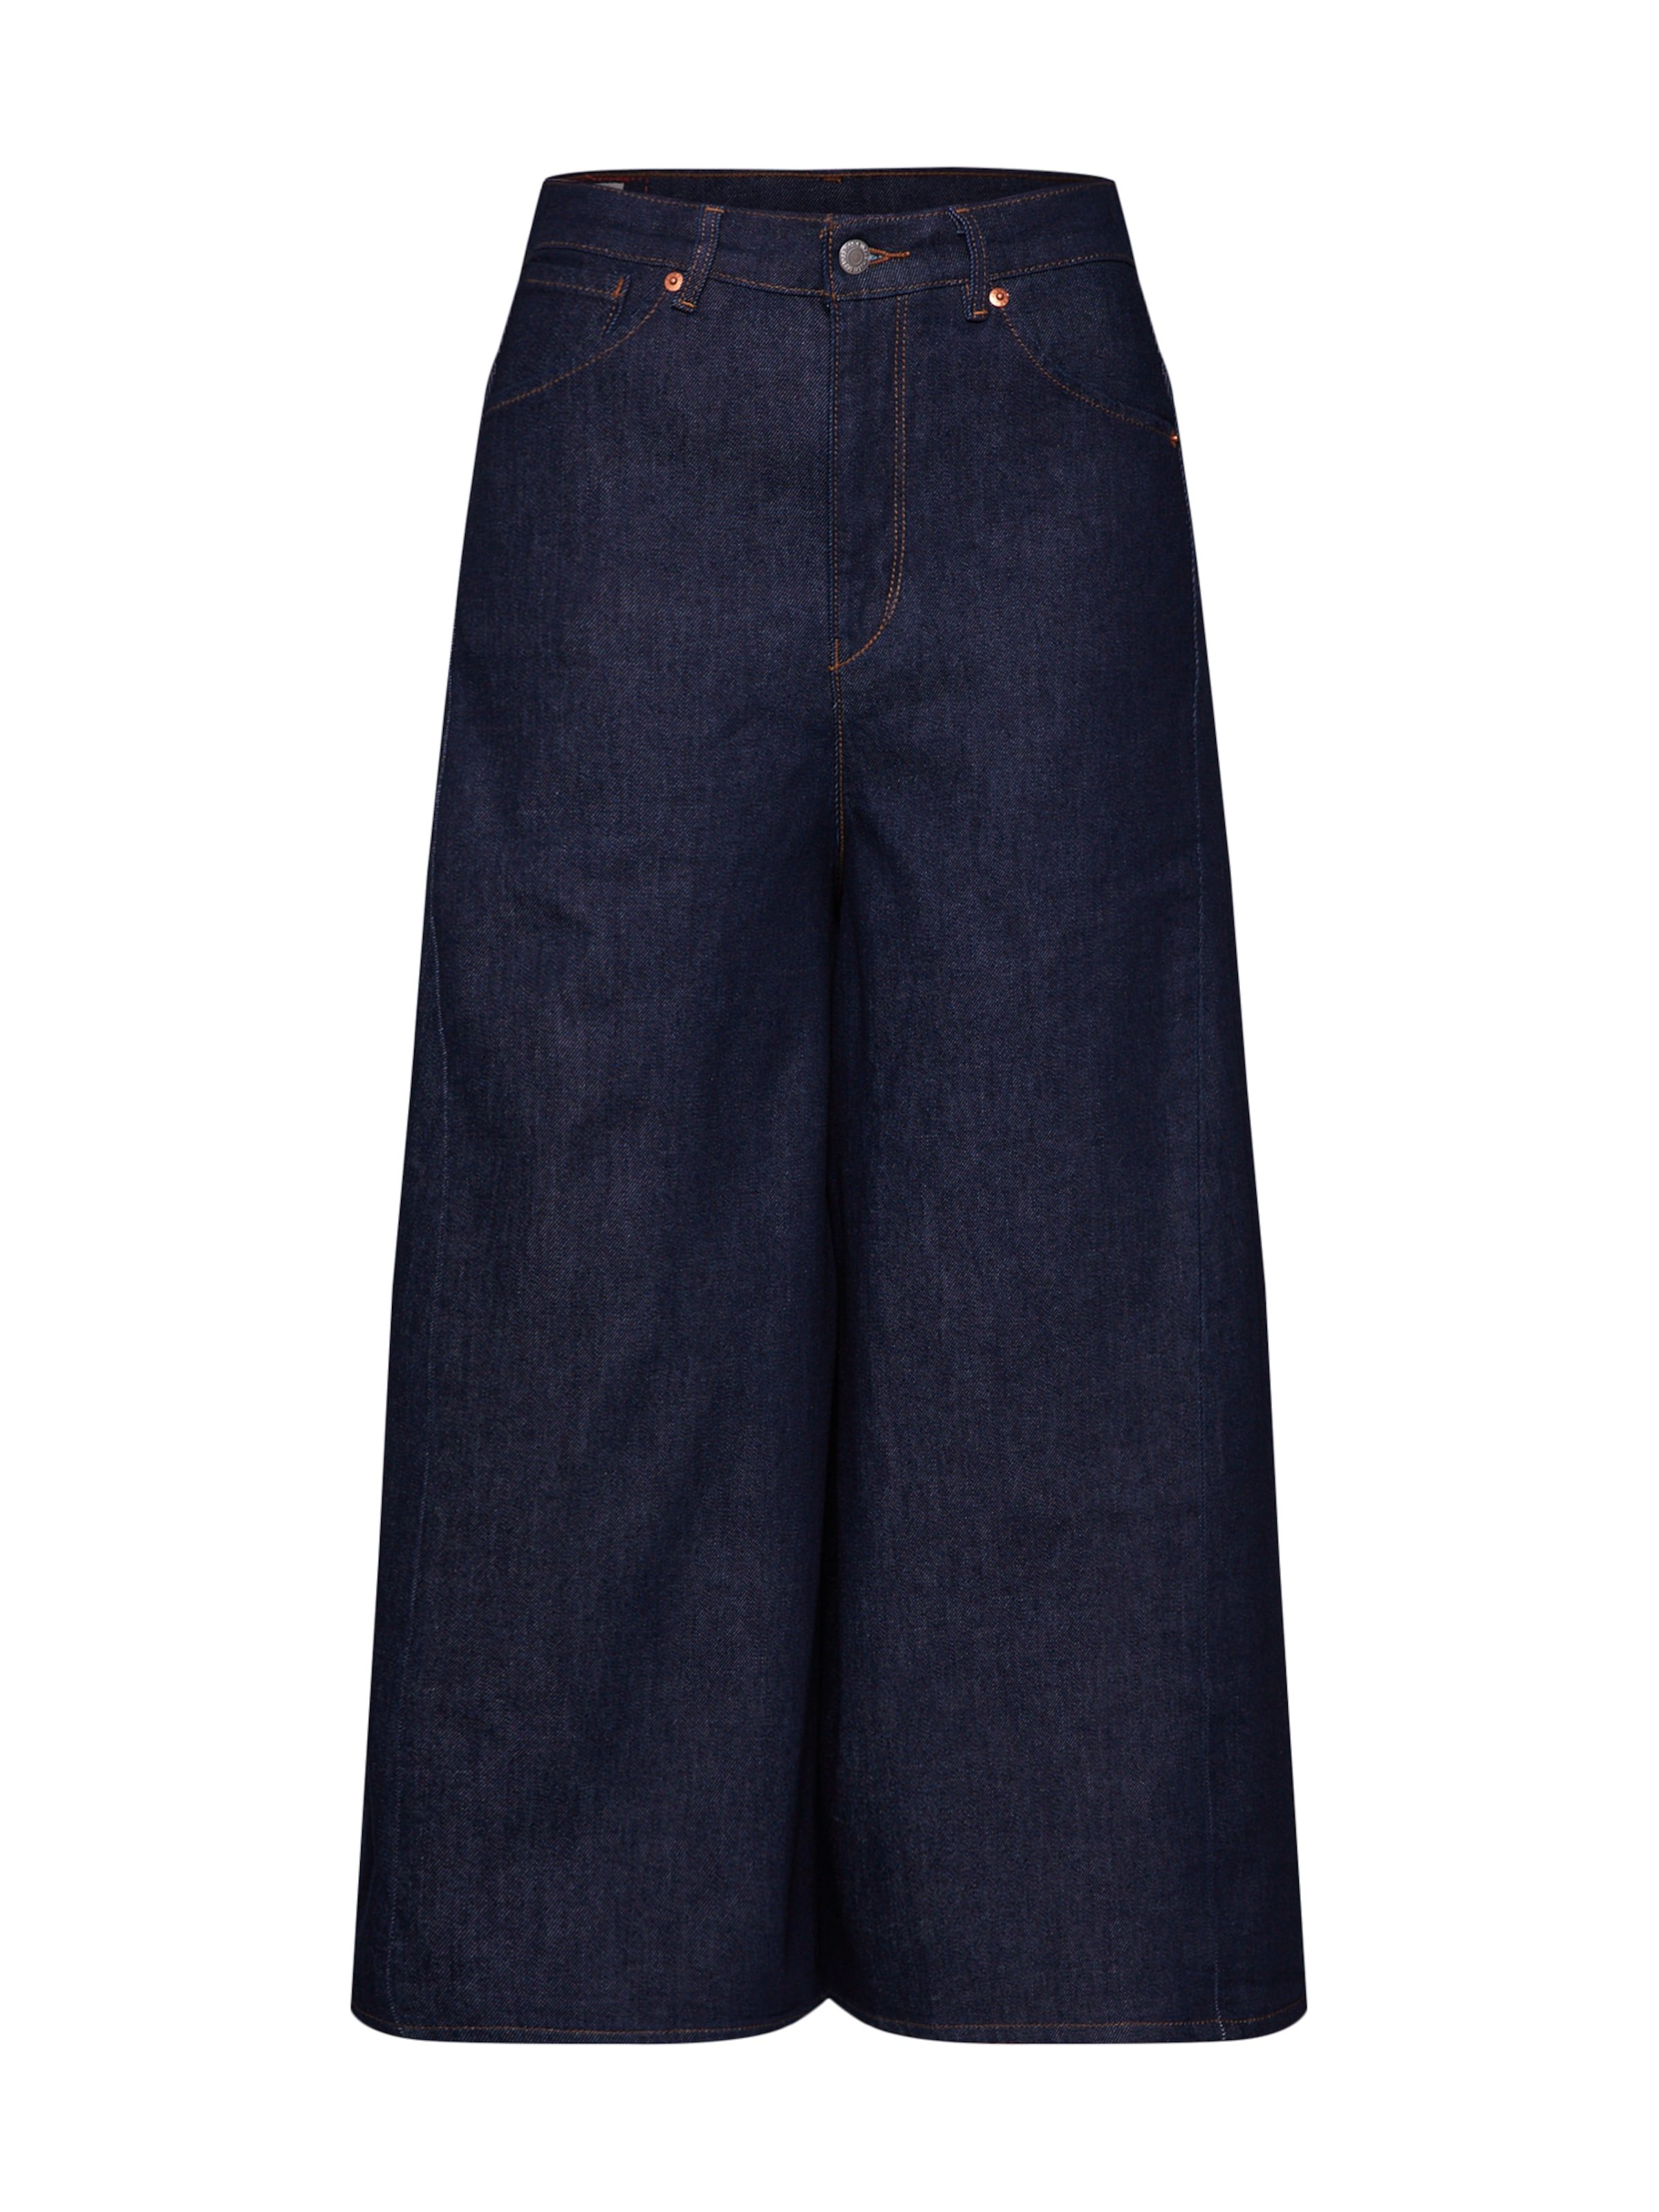 Jeans Loose' 1st Blau In 'lej Levi's 3lKuTF1Jc